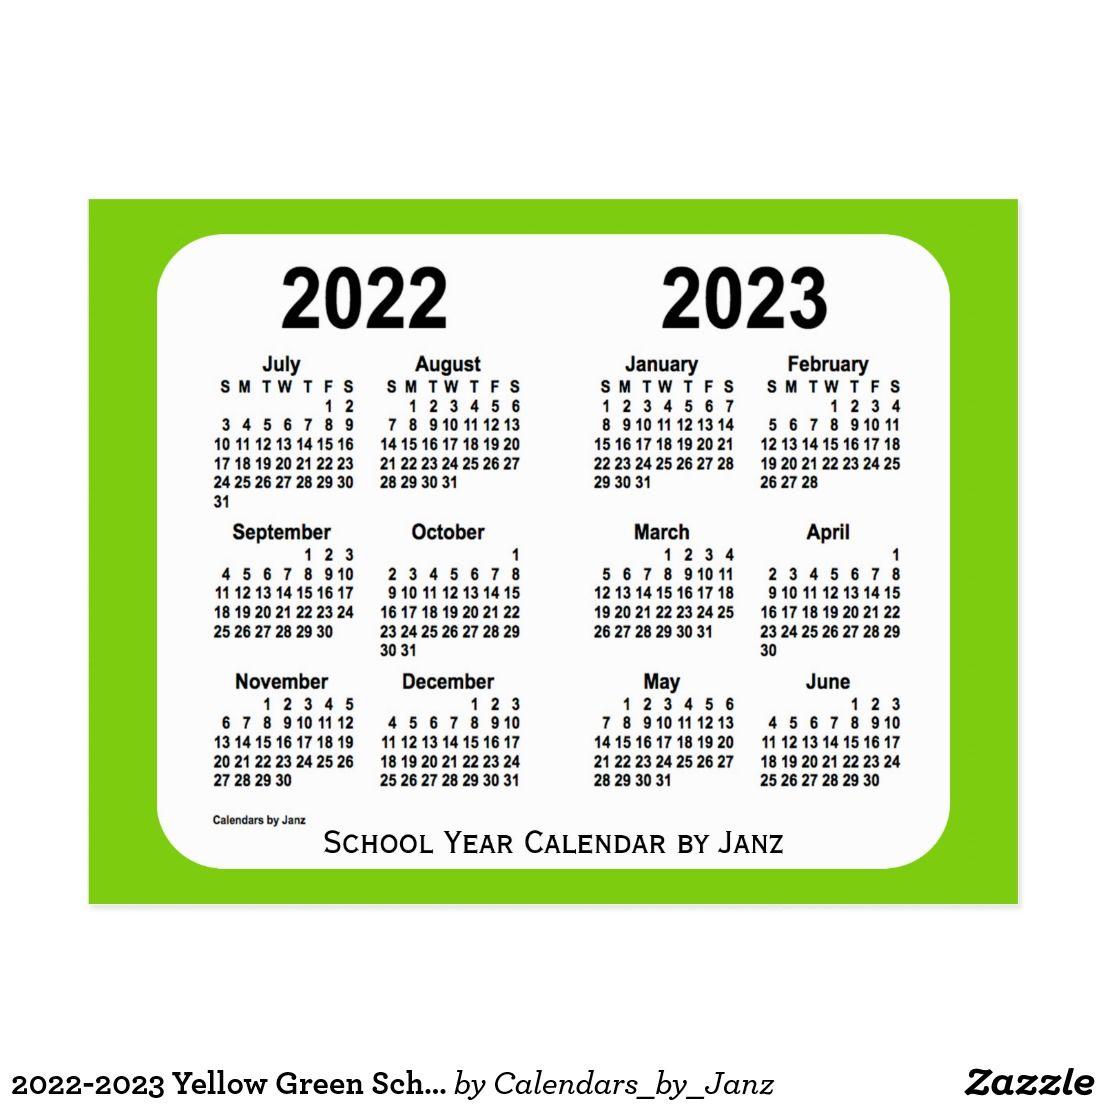 2022 23 Academic Calendar Template.2022 2023 Yellow Green School Calendar By Janz Postcard Zazzle Com School Calendar Green School School